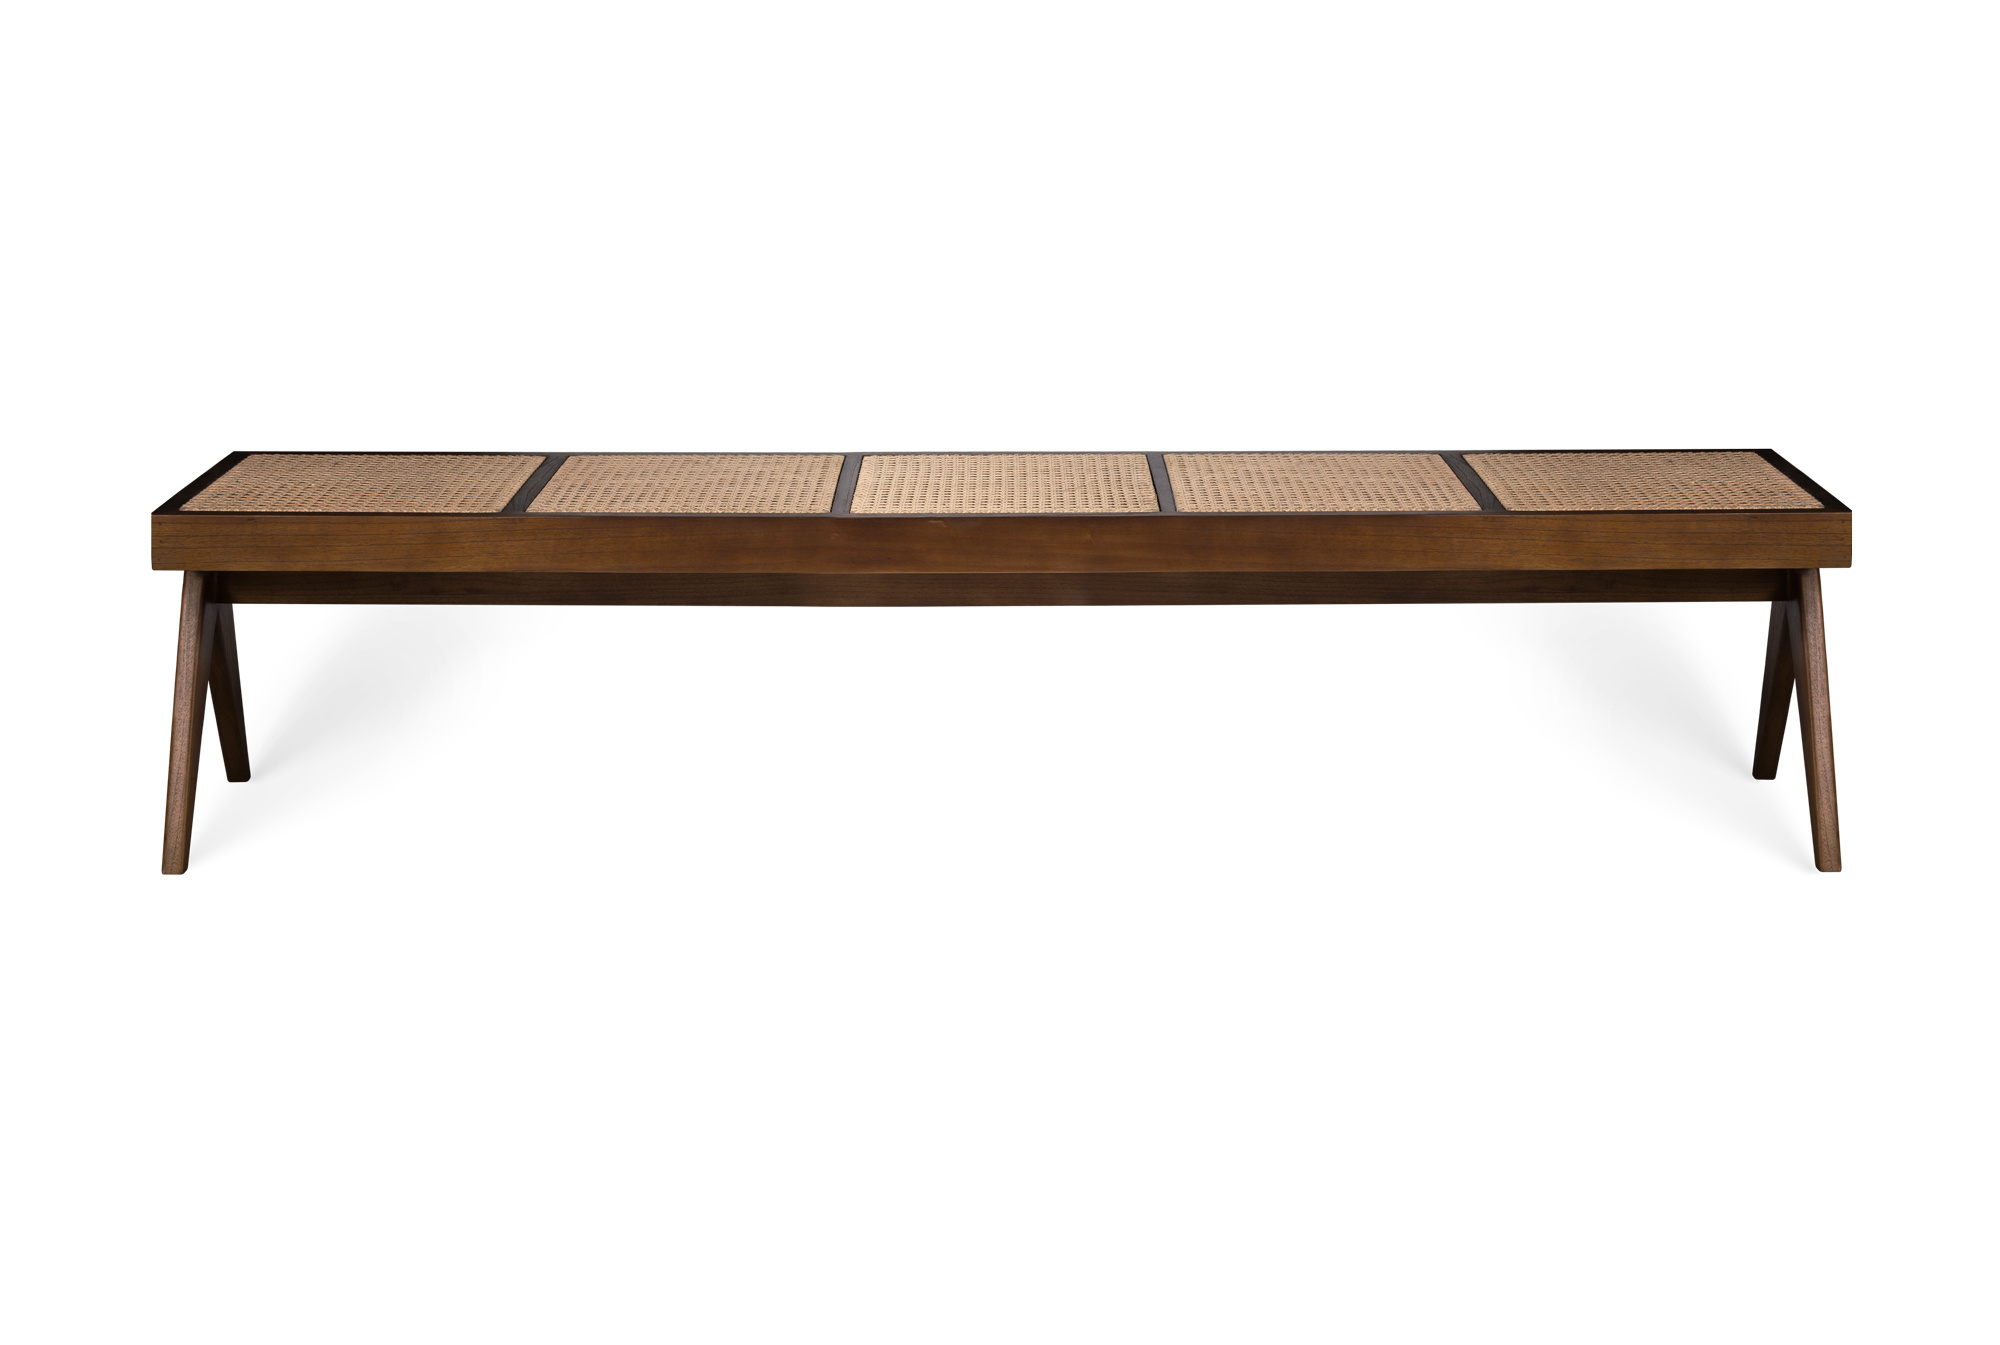 Bench / B.T.H. Flats 5-3